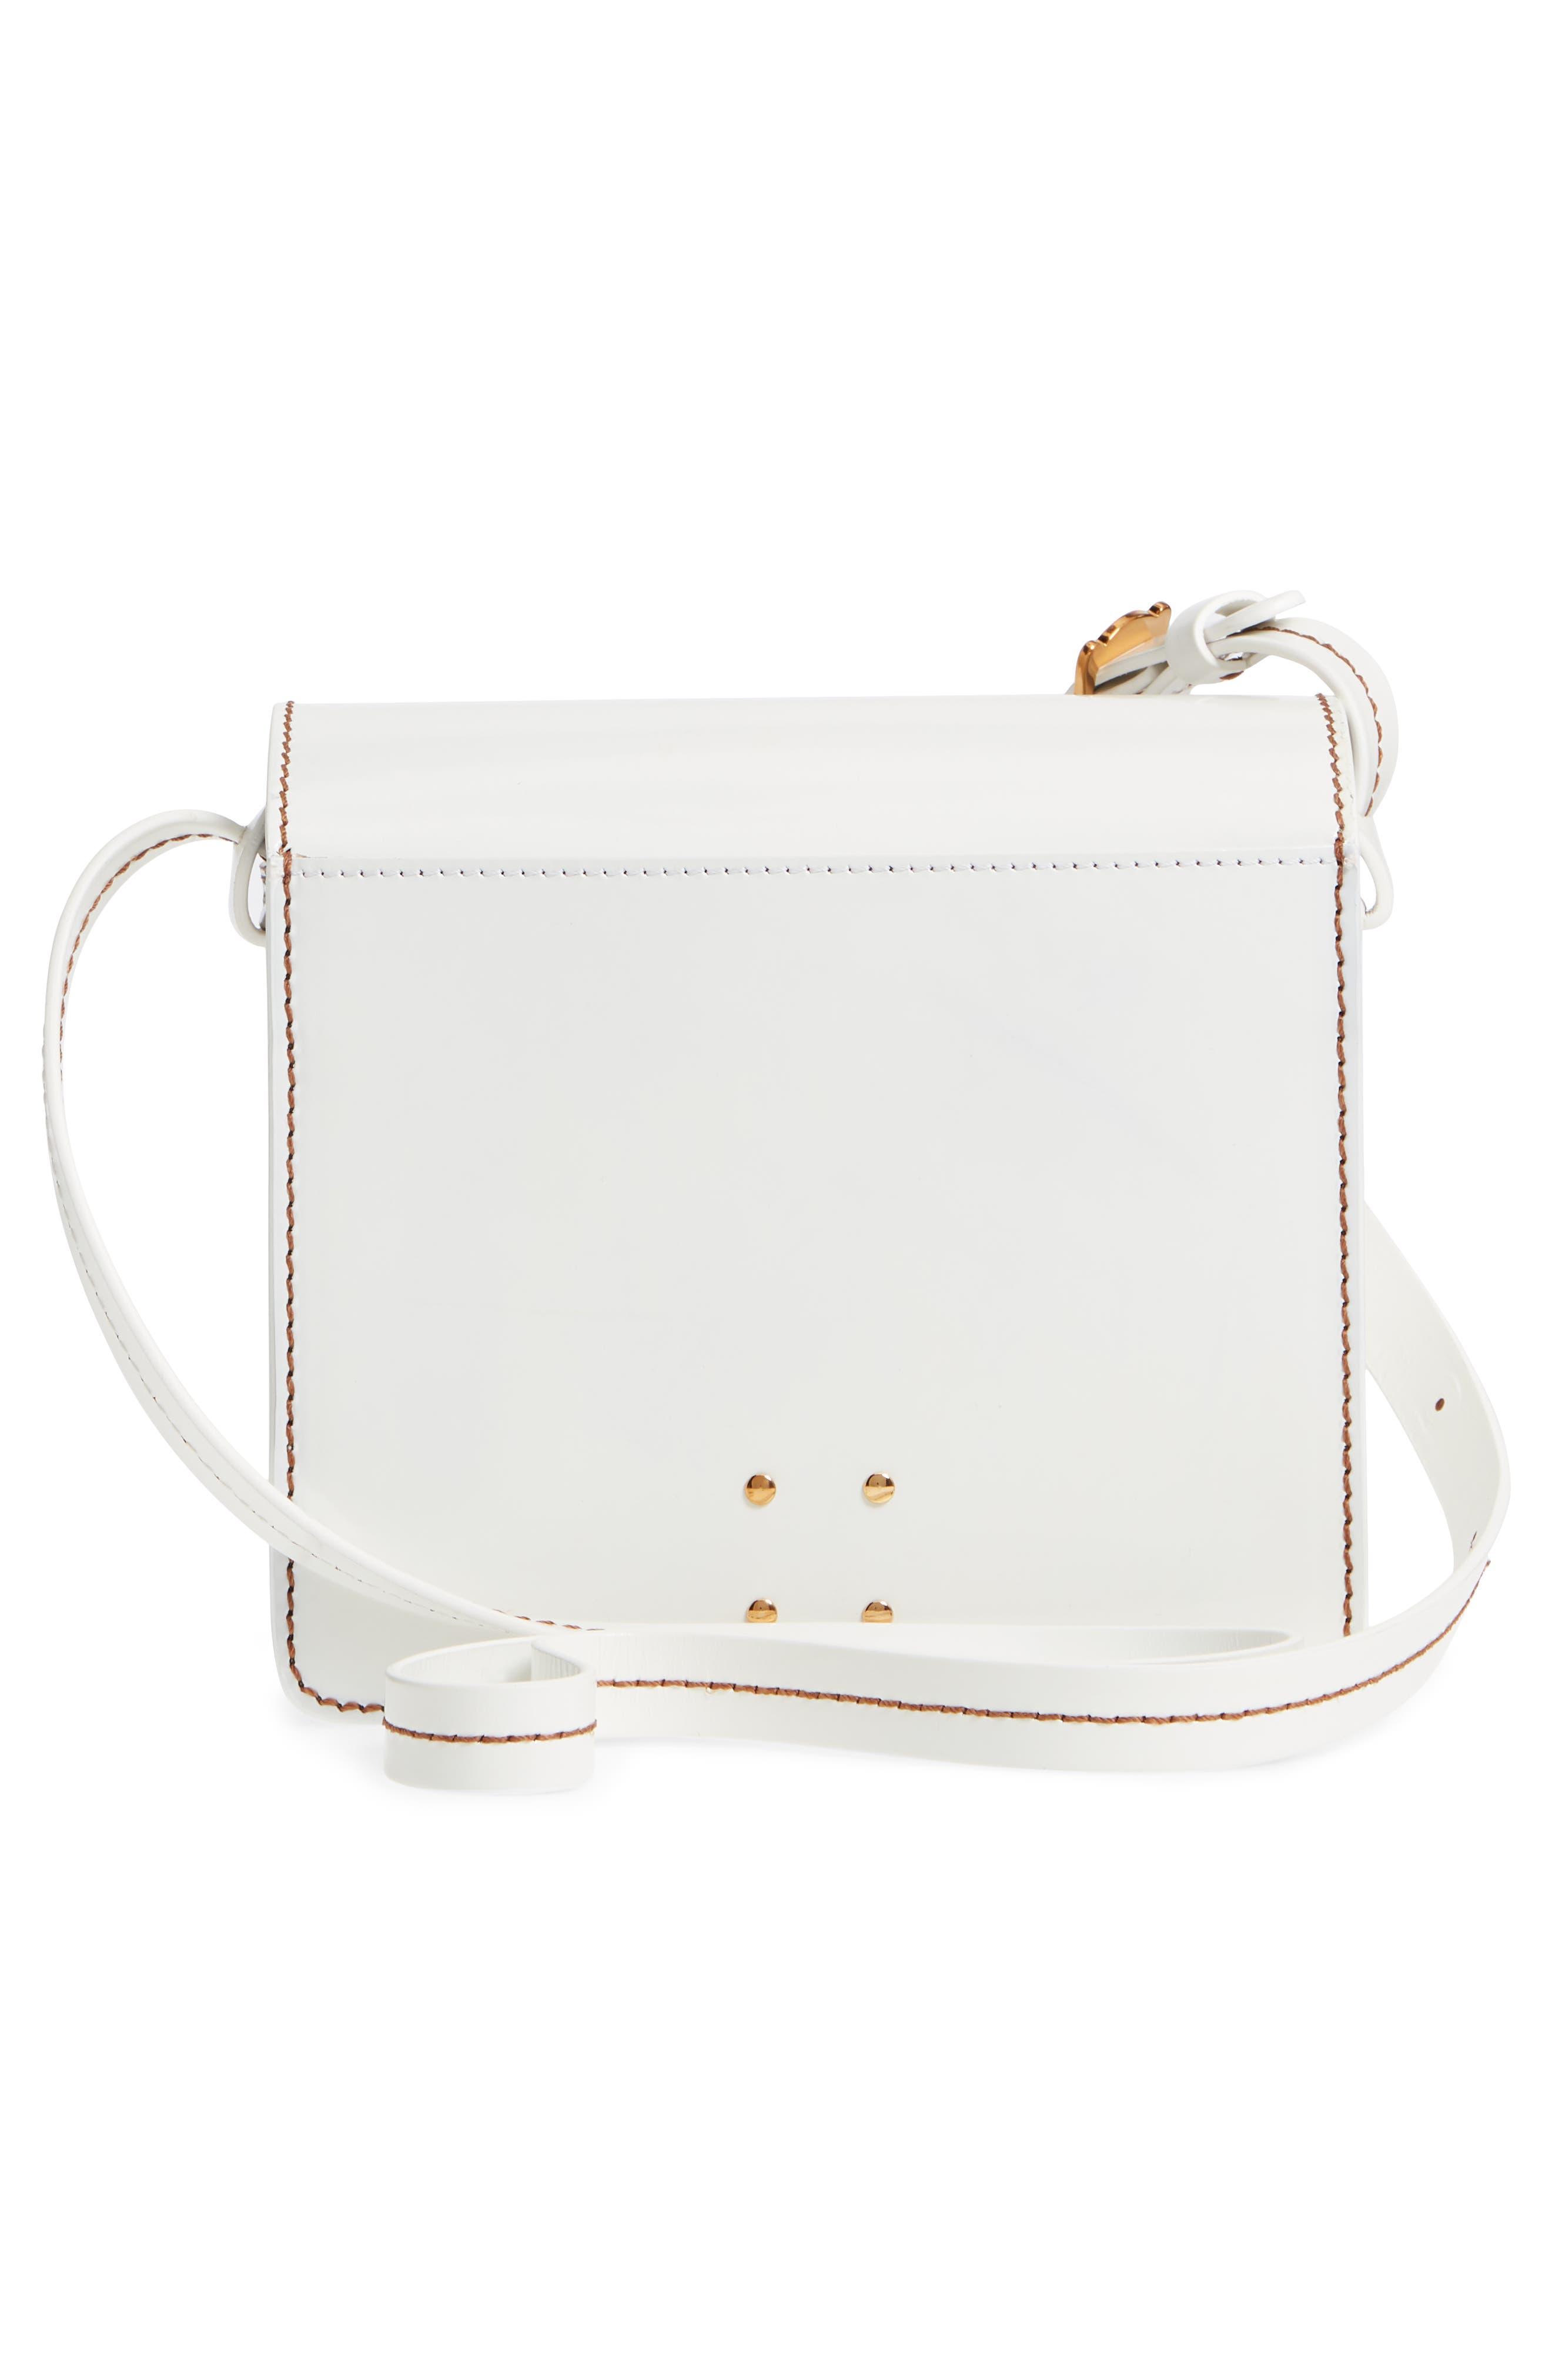 Greta Leather Crossbody Bag,                             Alternate thumbnail 3, color,                             White